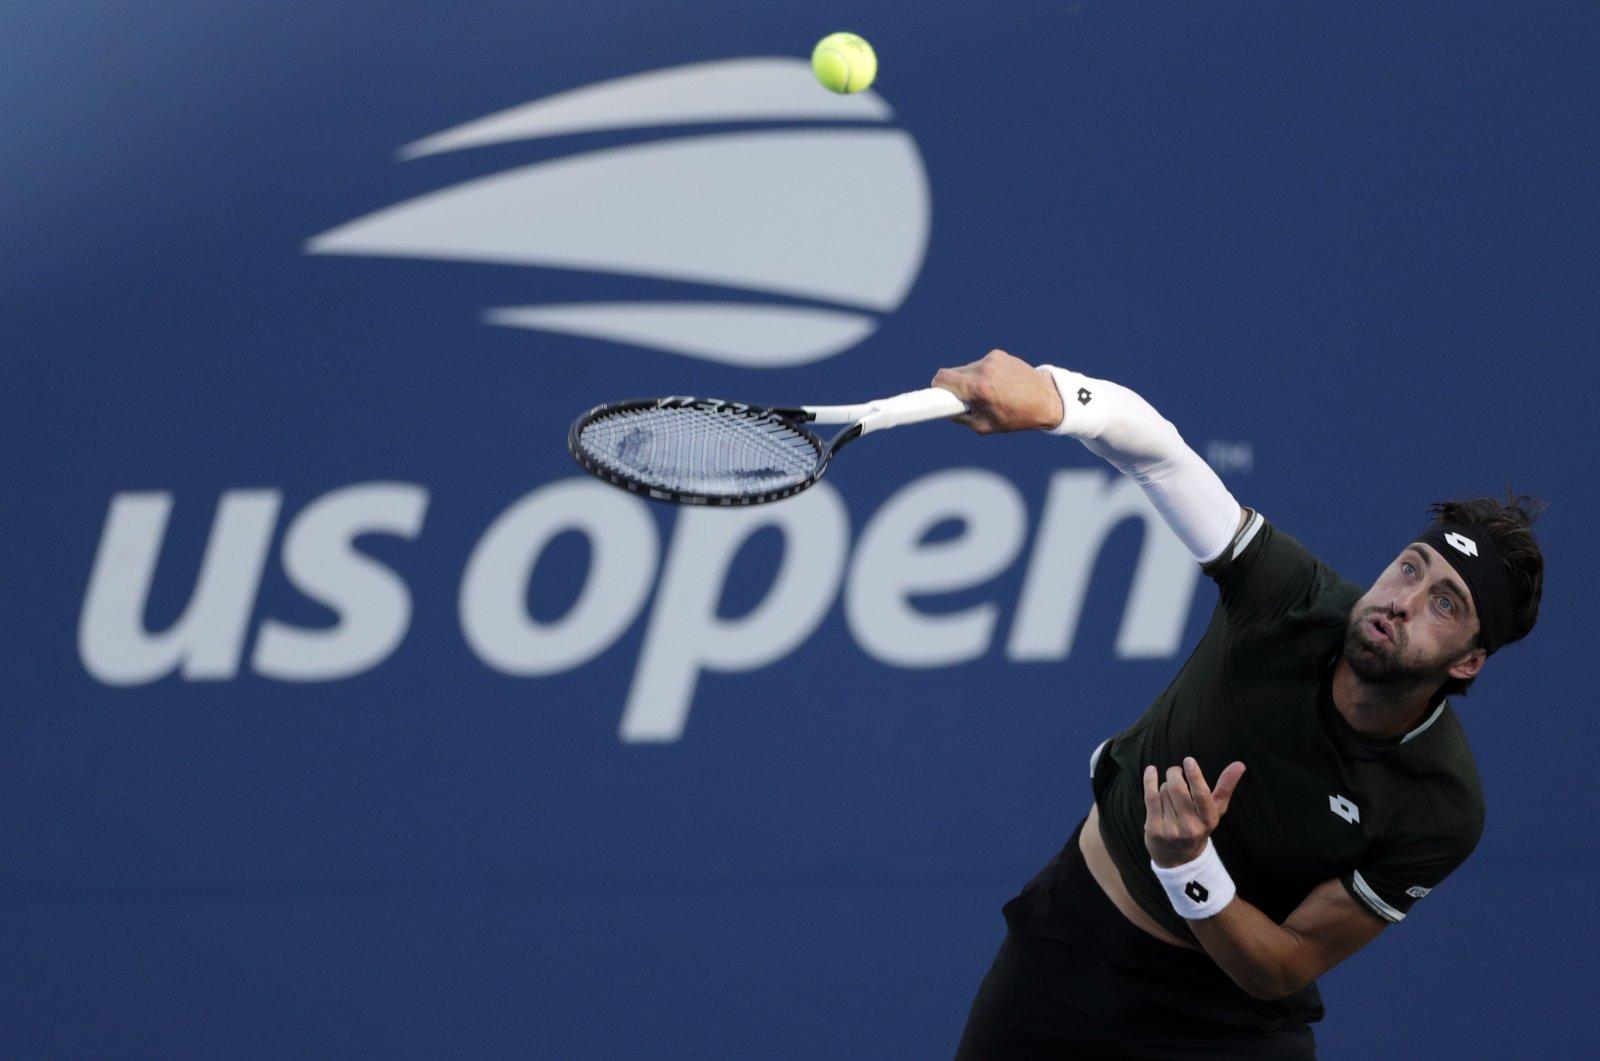 Nikoloz Basilashvili serves to Dominik Koepfer during the third round of the U.S. Open in New York, Aug. 30, 2019. (AP Photo)